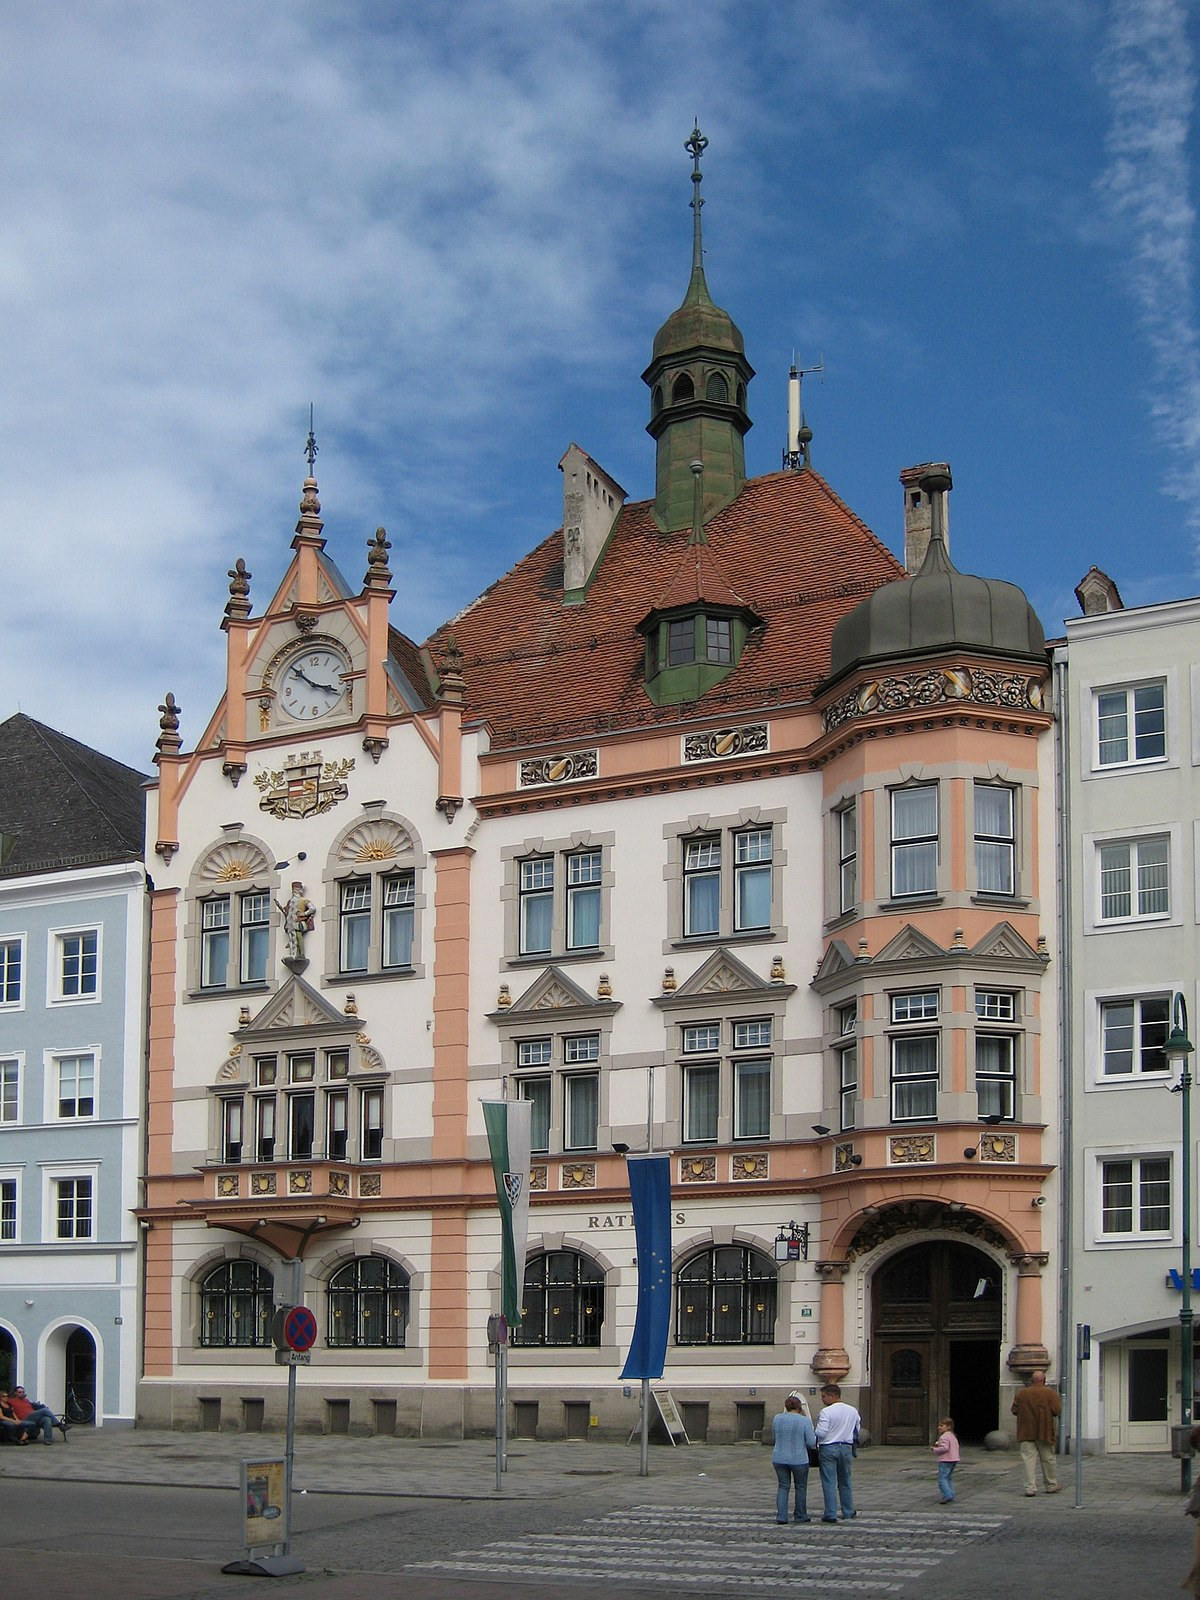 Seitensprung aus Braunau am Inn - carolinavolksfolks.com